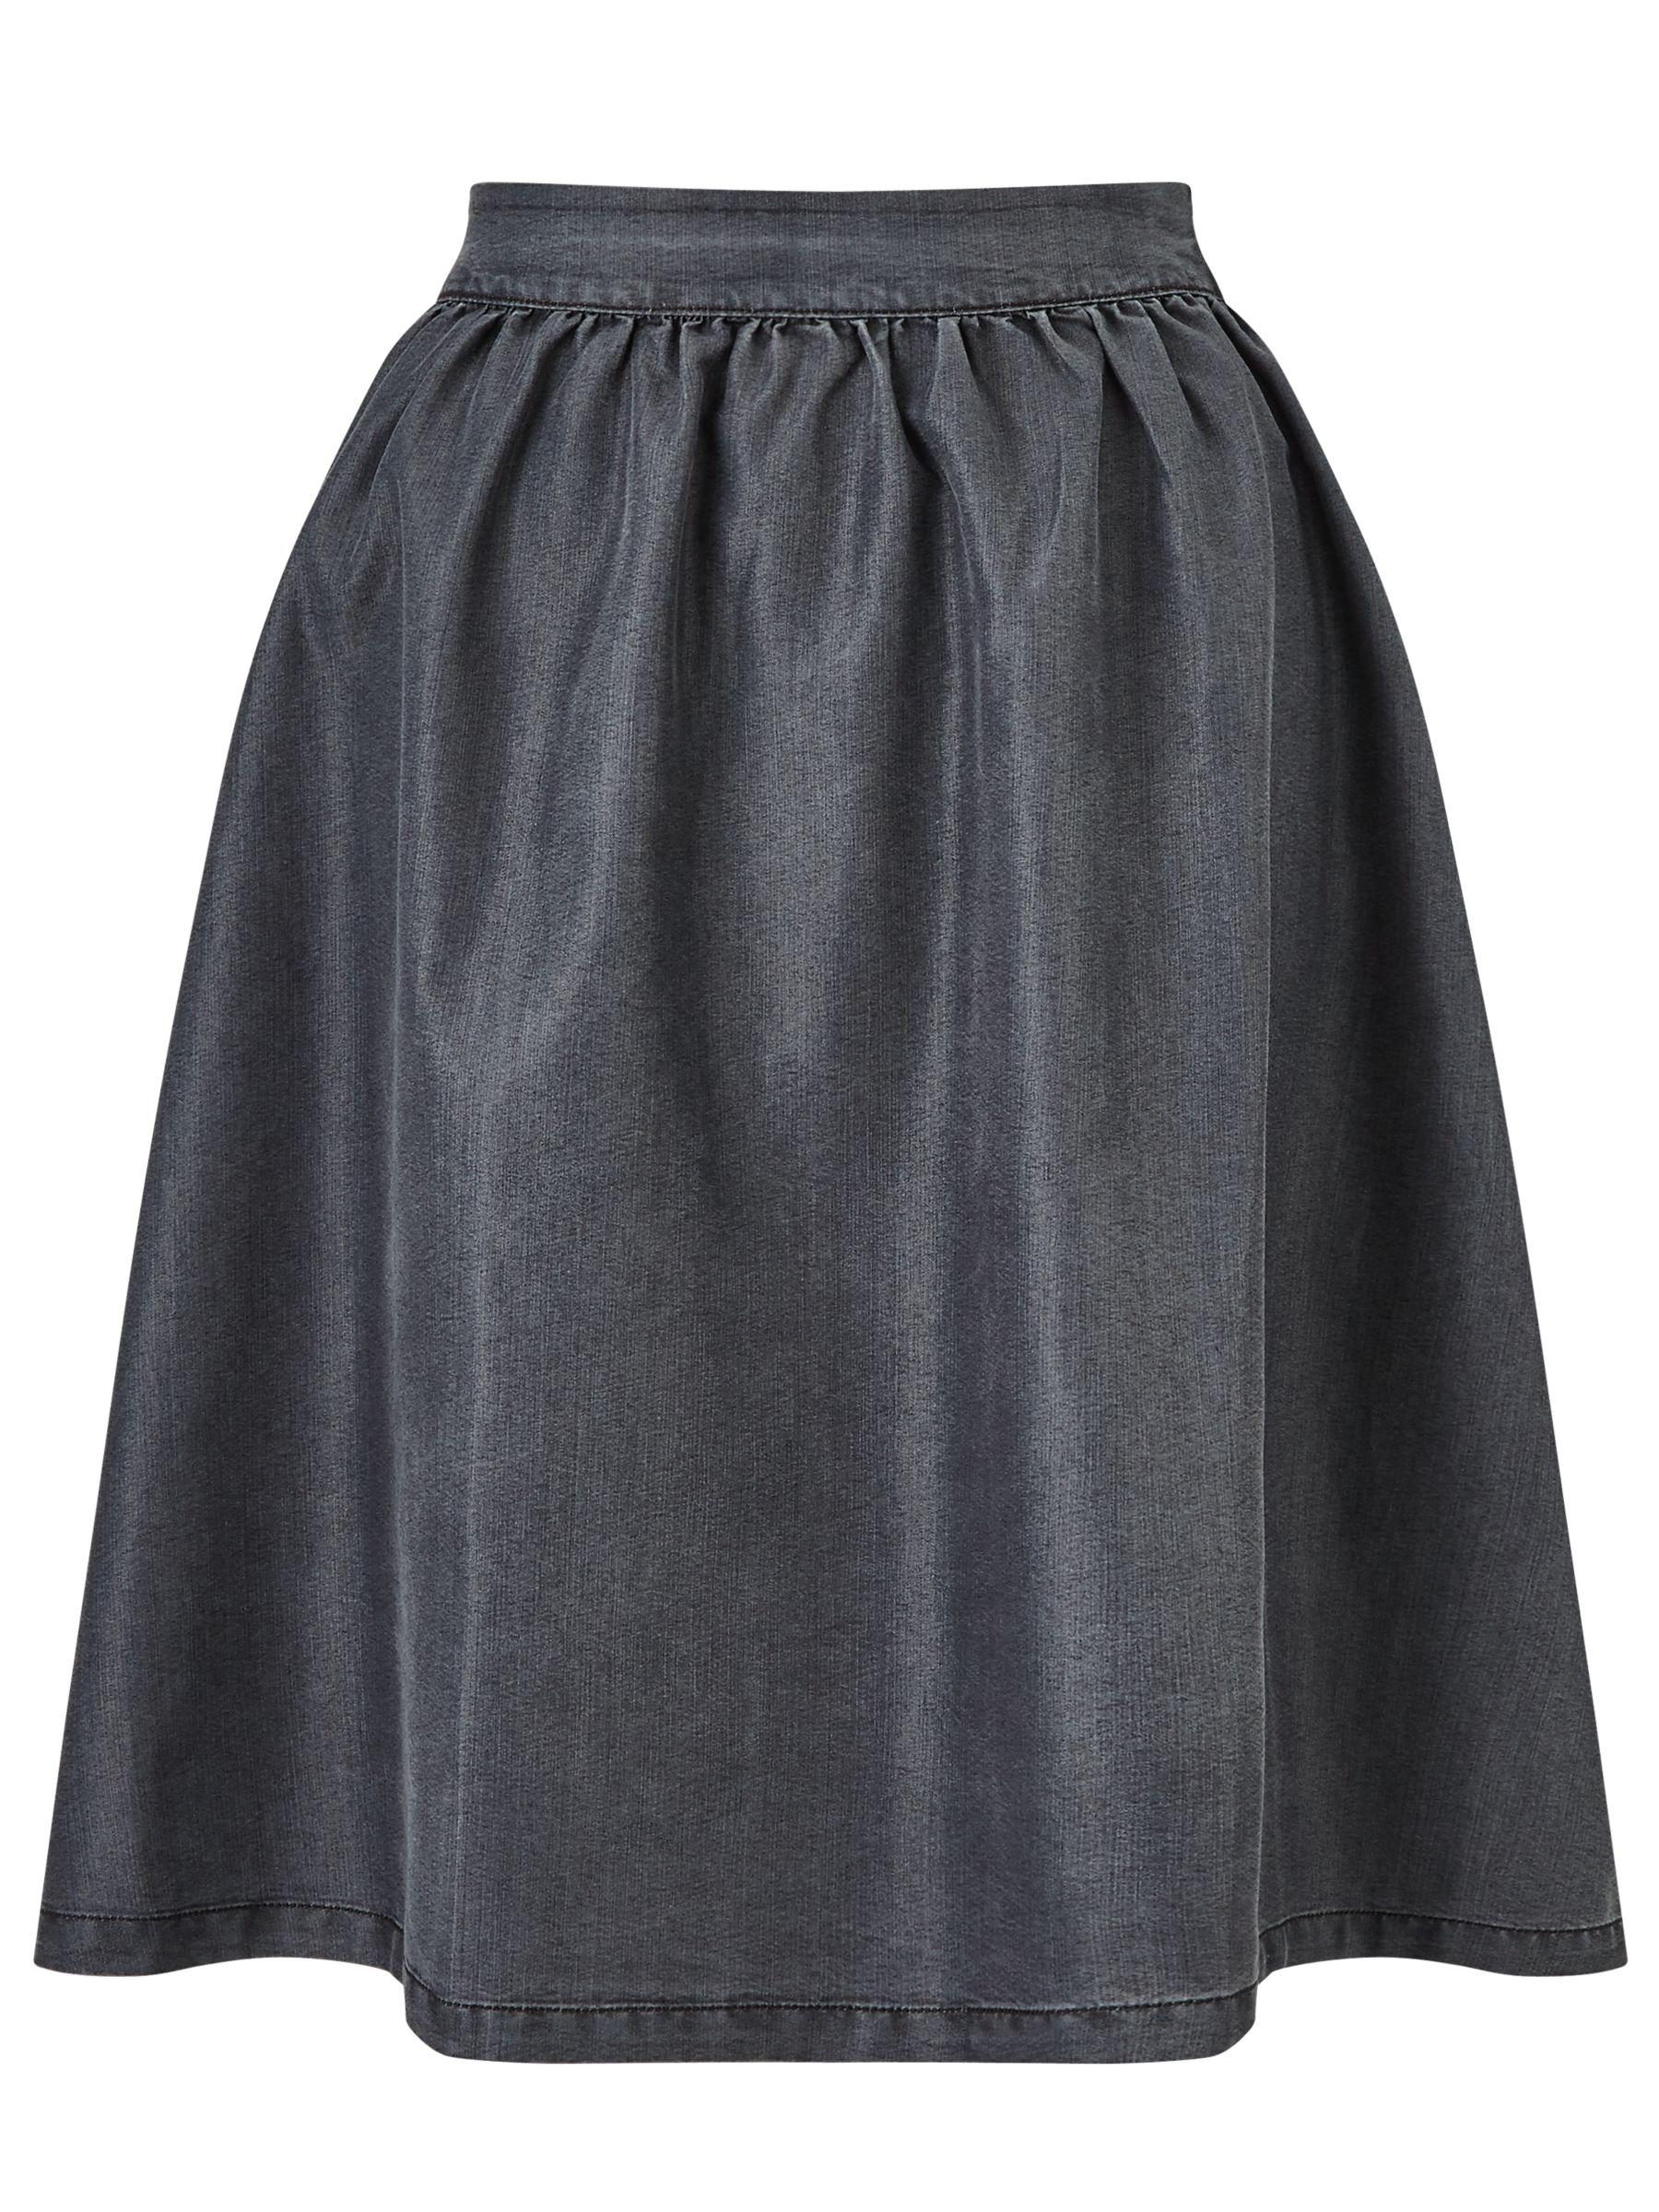 Minimum Minimum Baltima Denim Skirt, Medium Grey